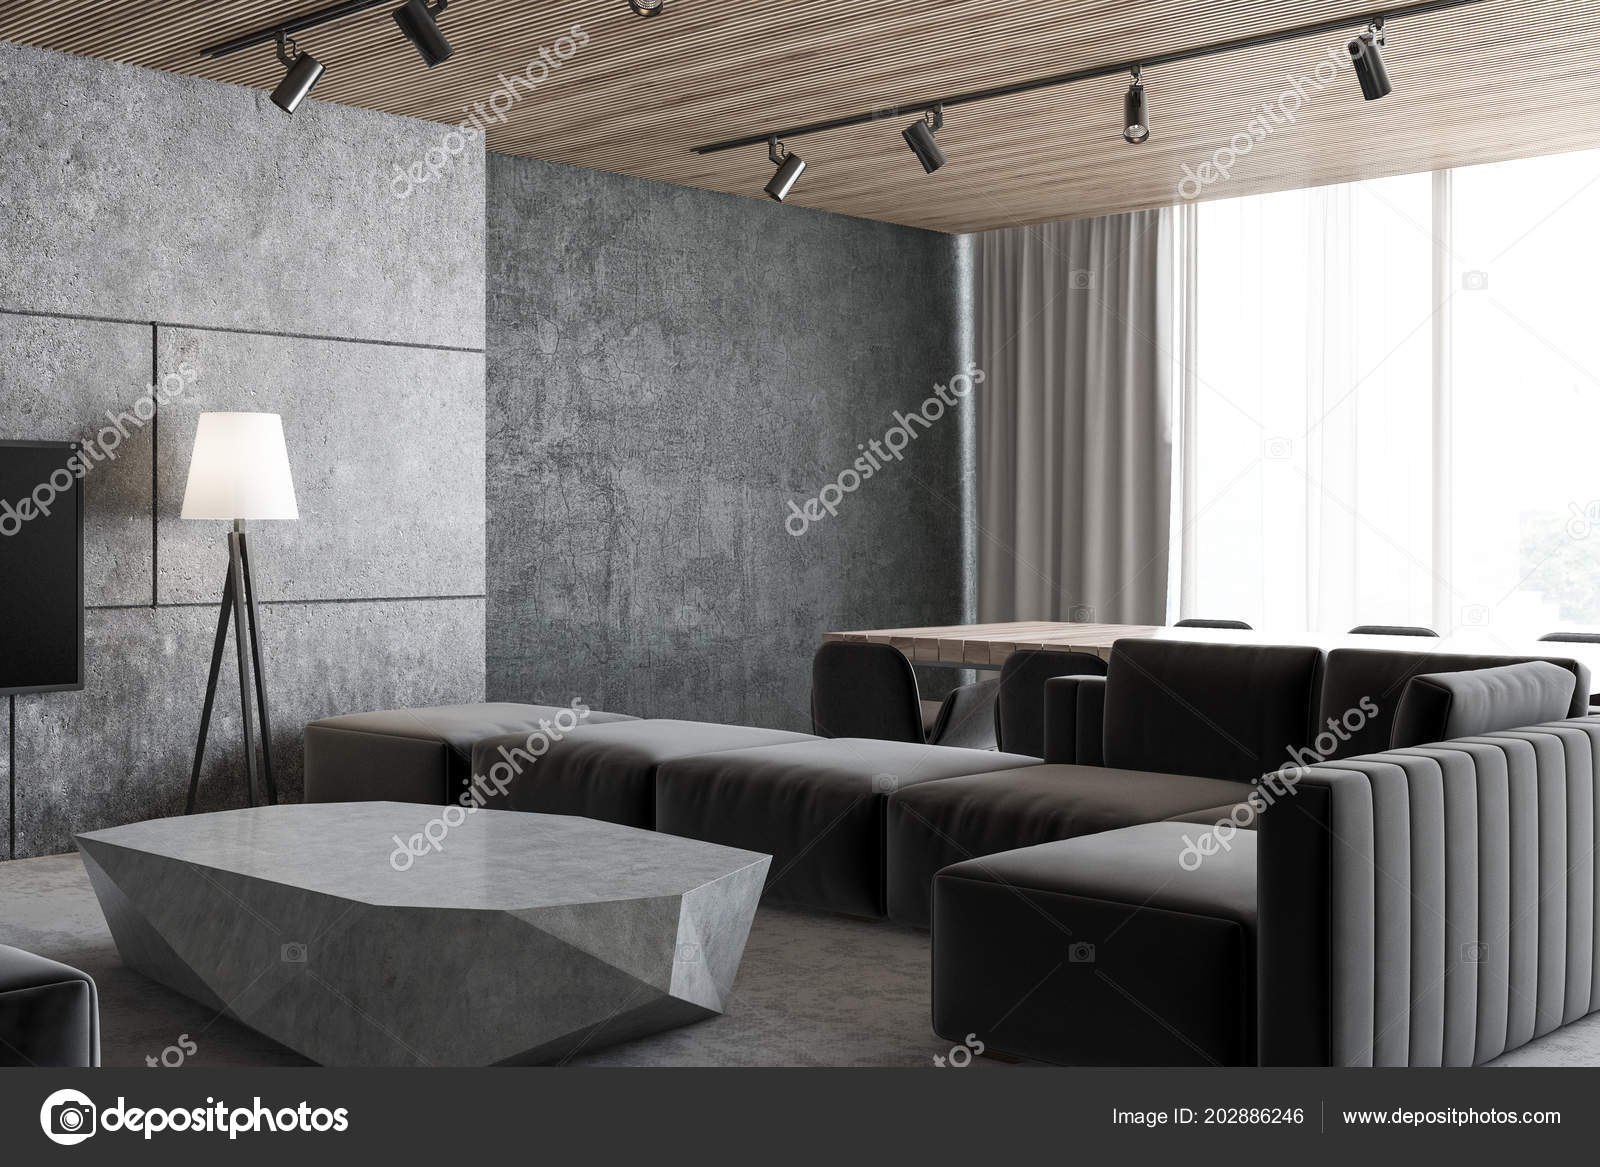 Concrete Loft Living Room Corner Gray Floor Dark Gray Couch